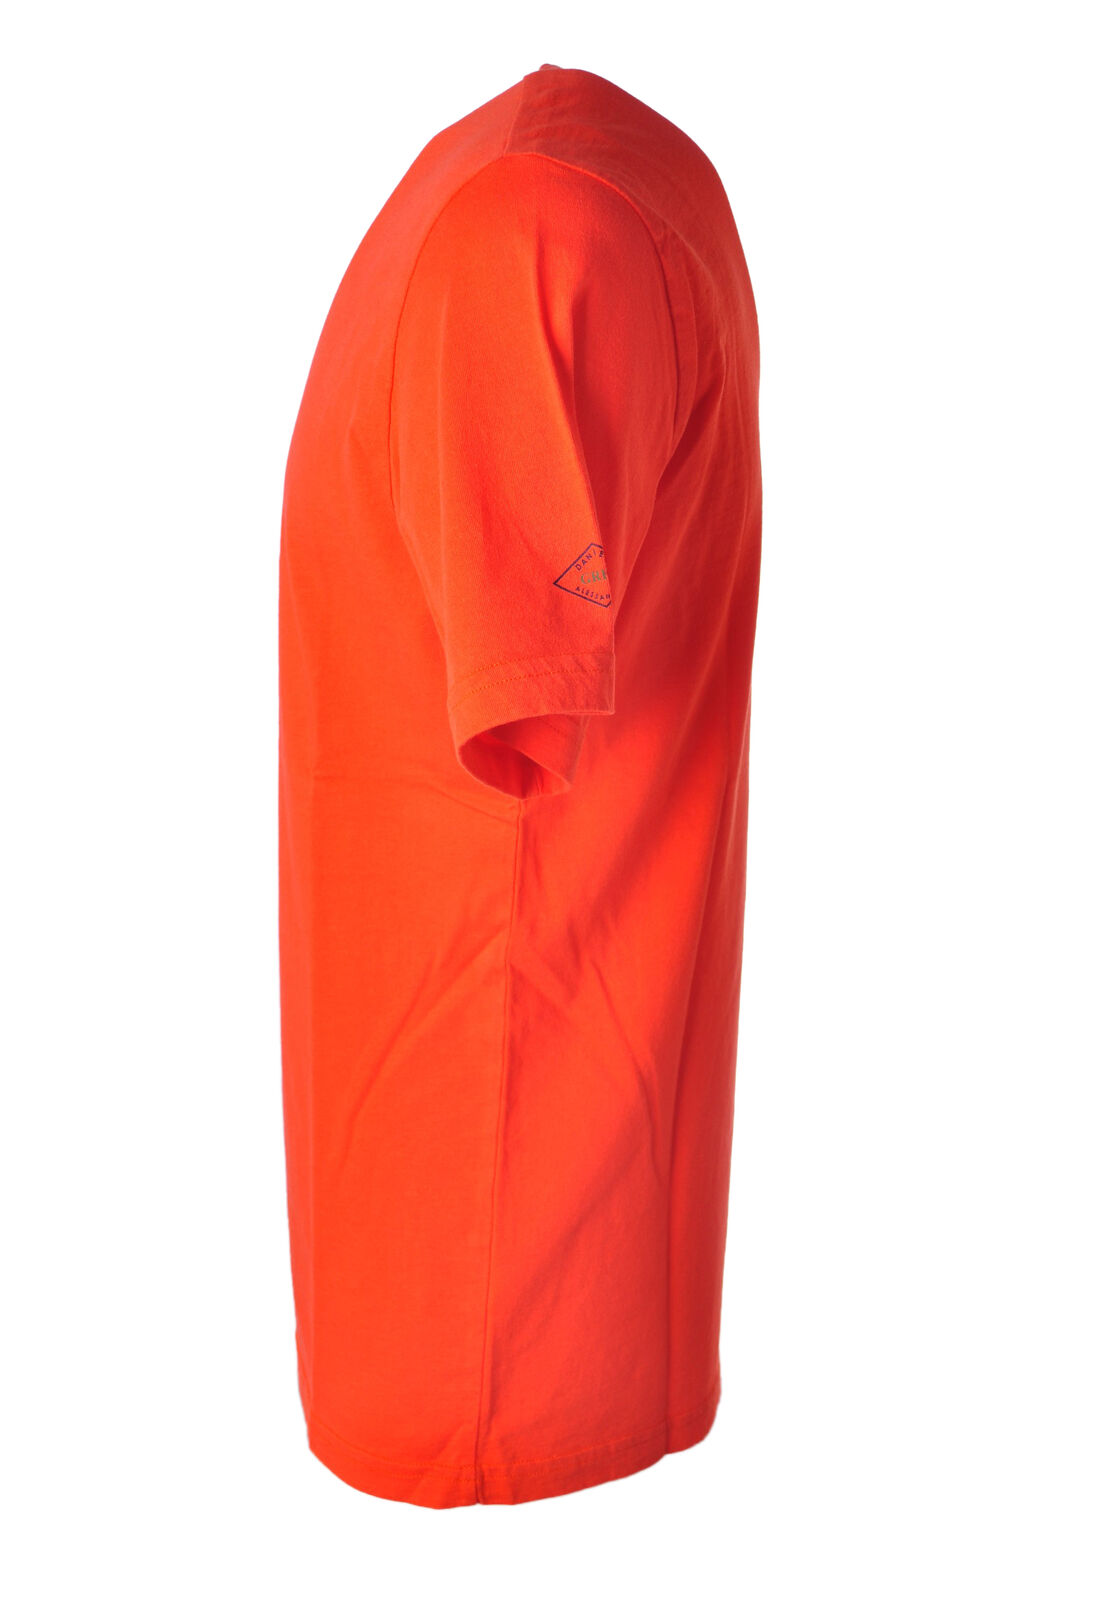 Daniele Alessandrini - Topwear-T-shirts - Man - - rosso - Man 4756731G181823 cf5b33